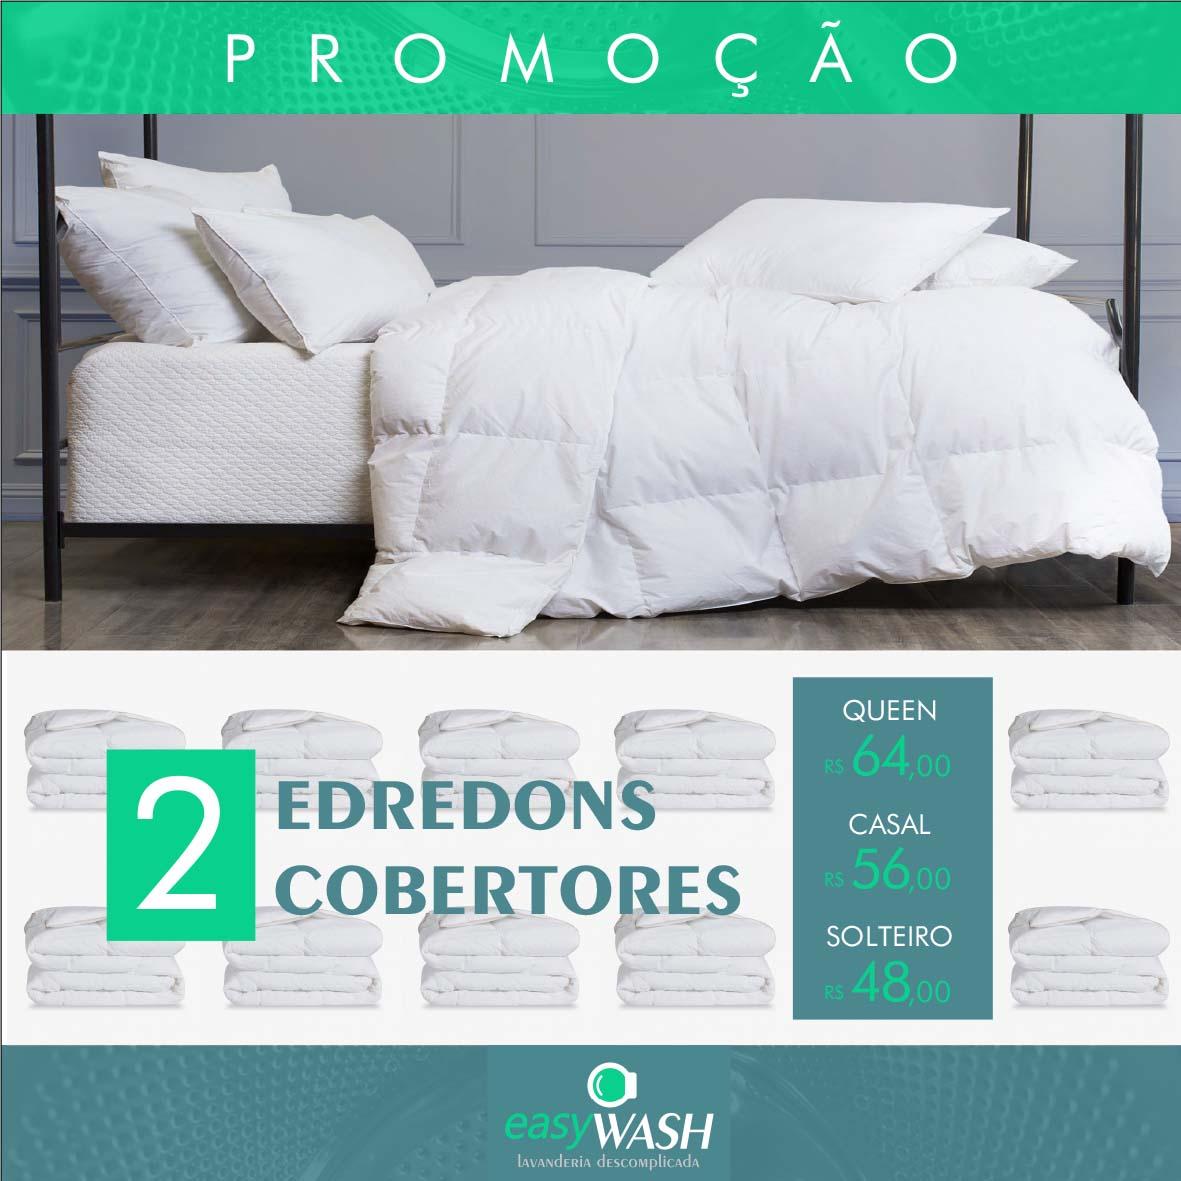 PROMO 2 EDREDONS/ COBERTORES